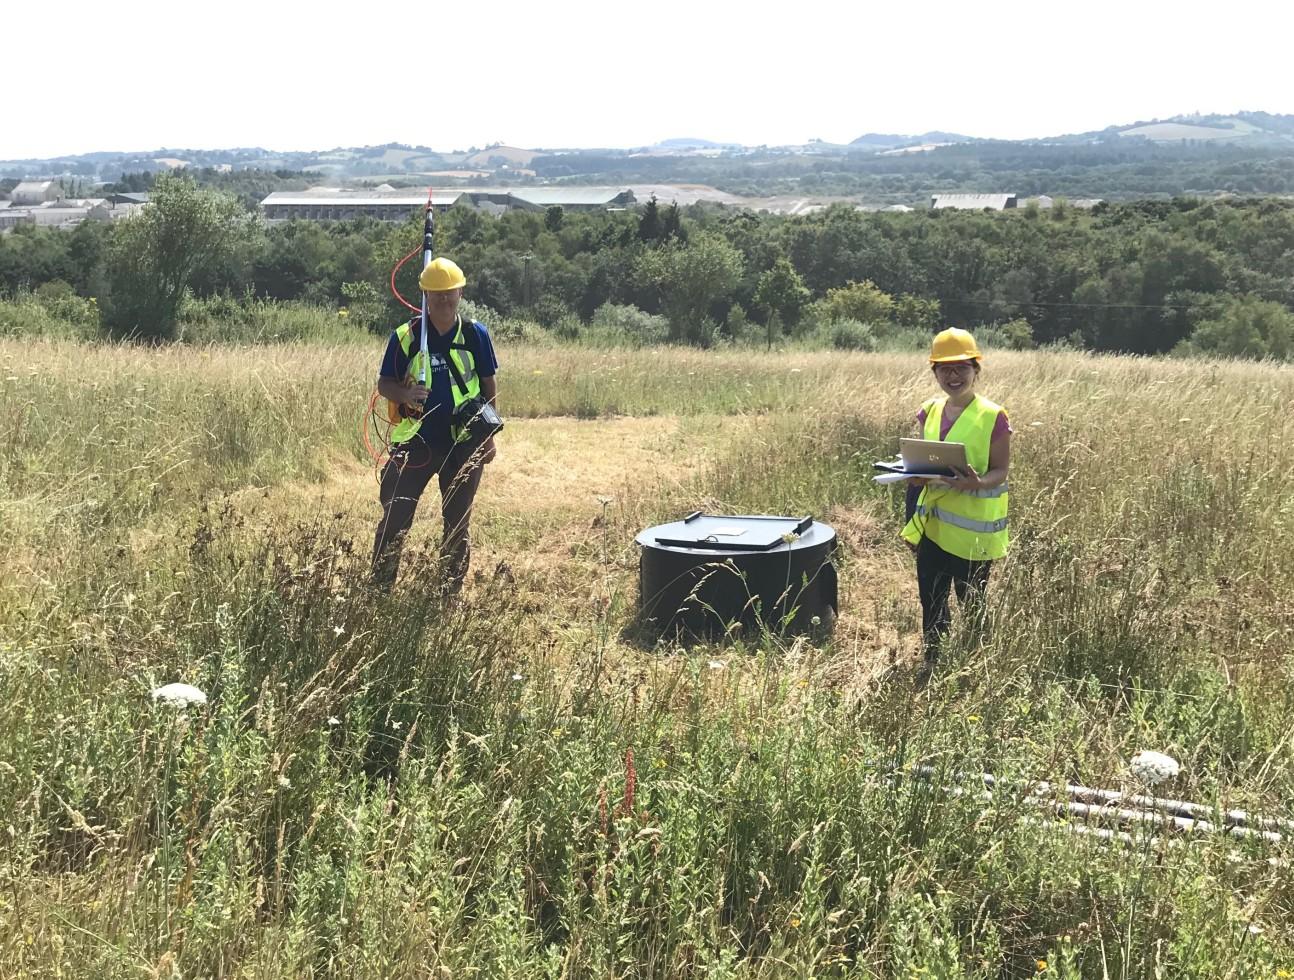 Semra carrying out fieldwork